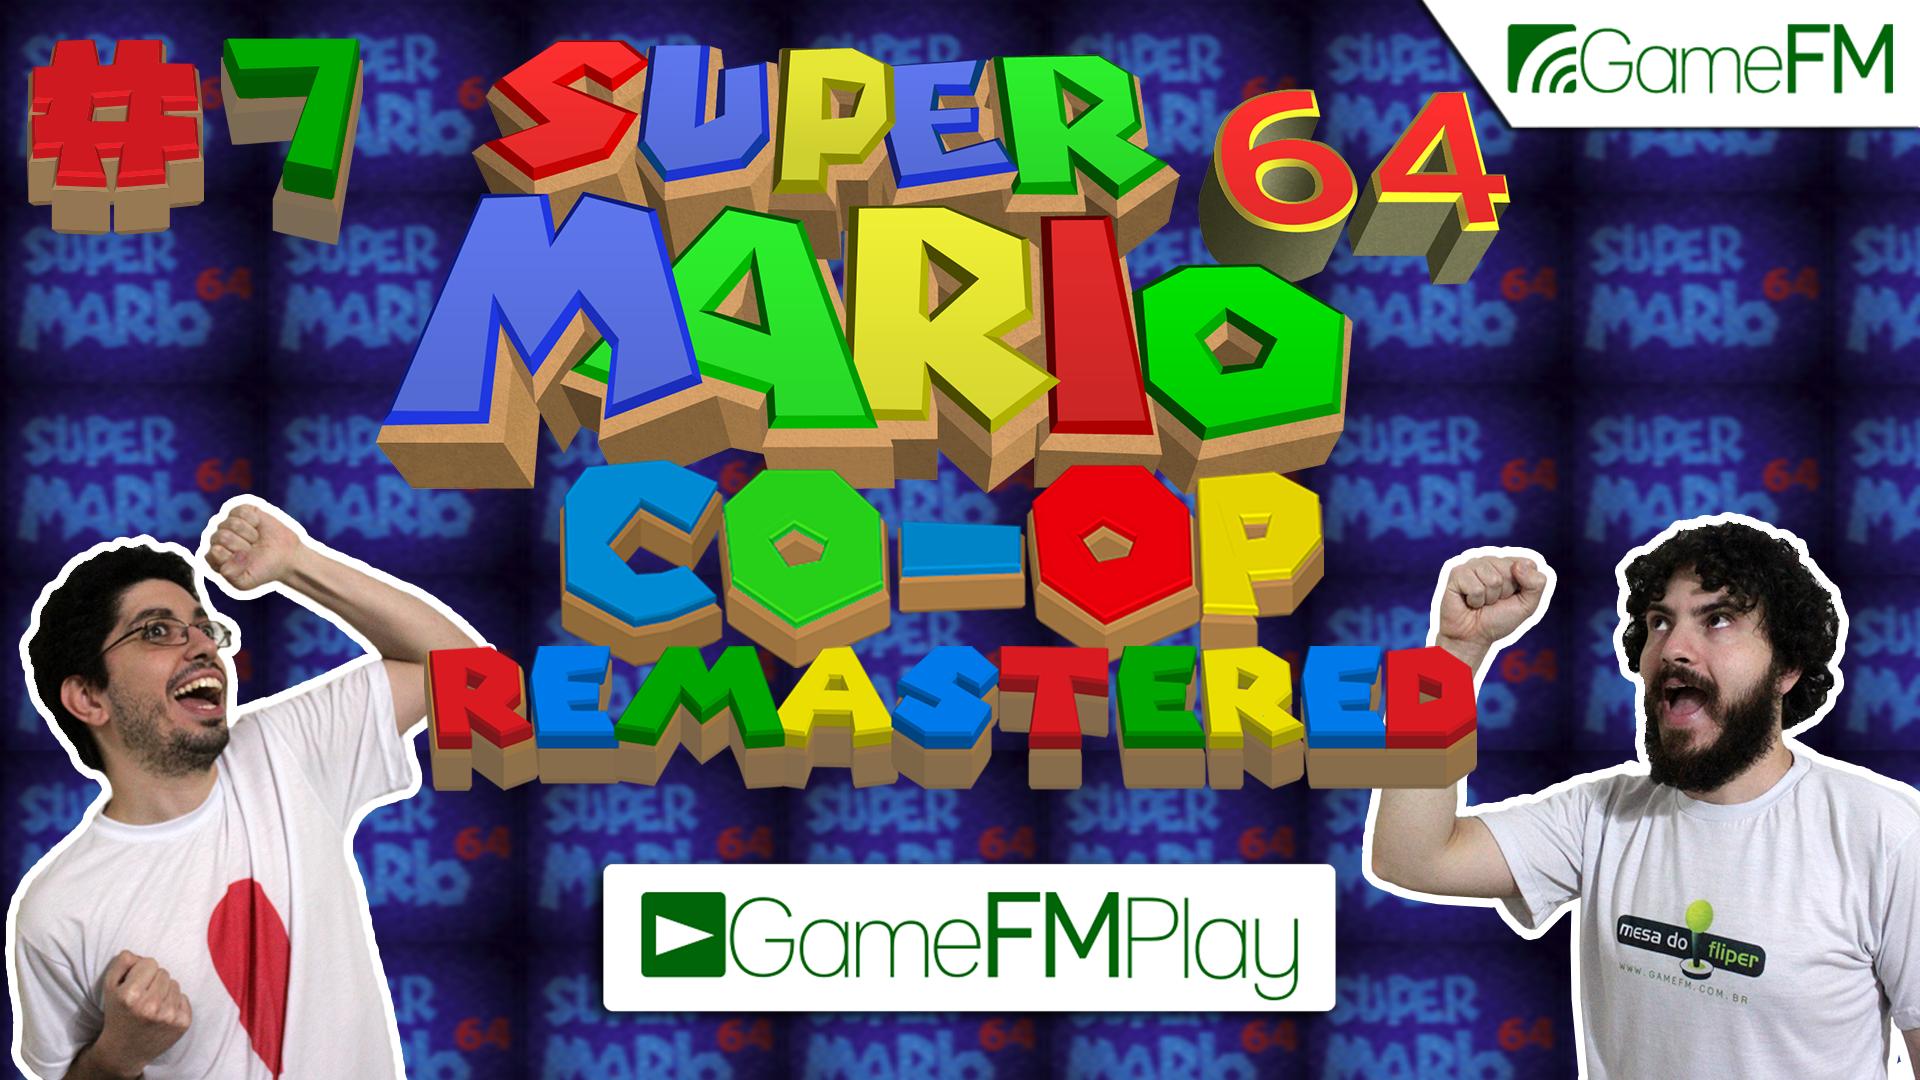 Mario64Remastered7